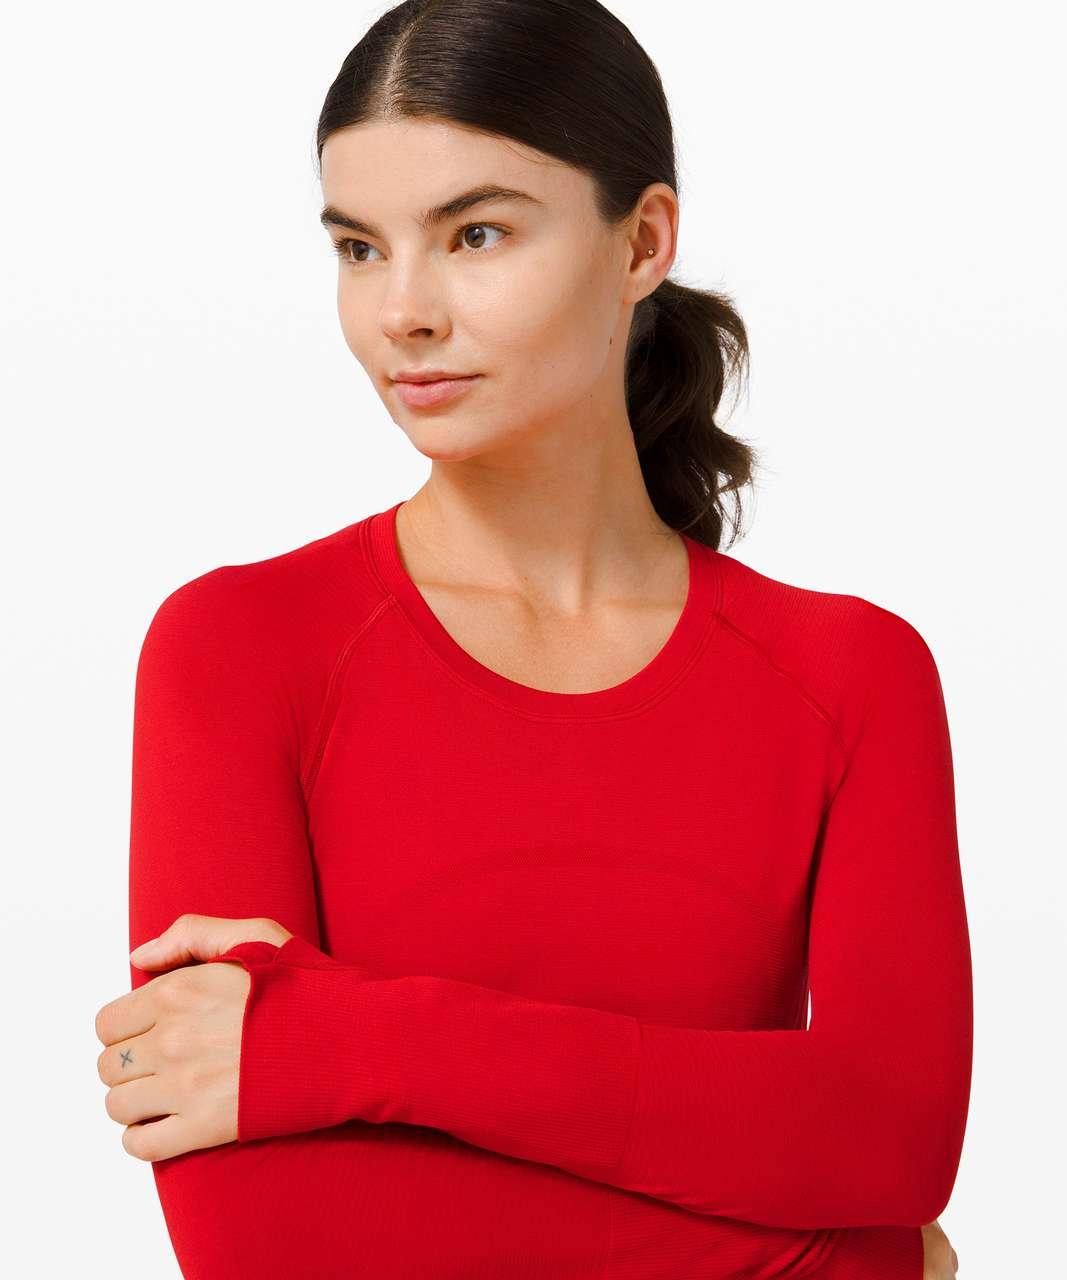 Lululemon Swiftly Tech Long Sleeve 2.0 - Dark Red / Dark Red